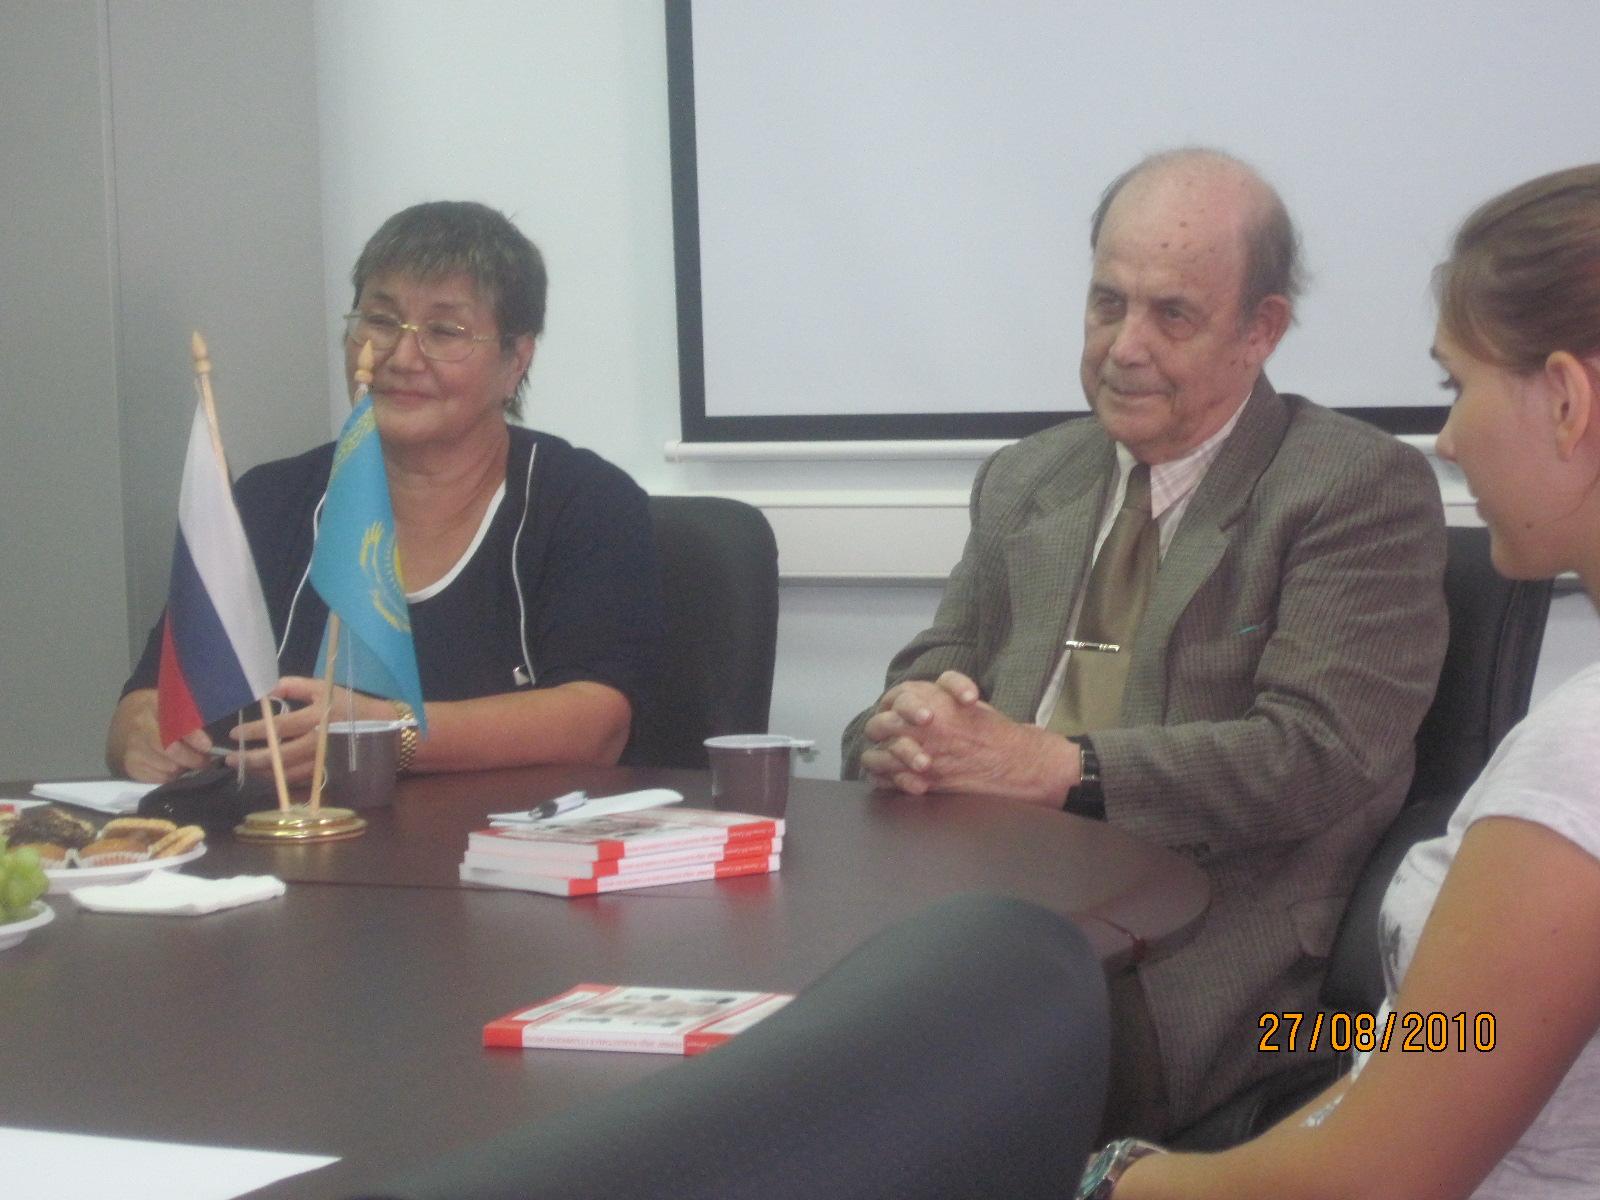 Akhmetova_Laila_2010_08_27_Stalin_KZ_leaders_03_Akhmetova_Laila_Grigoryev_Vladisl_Nekto